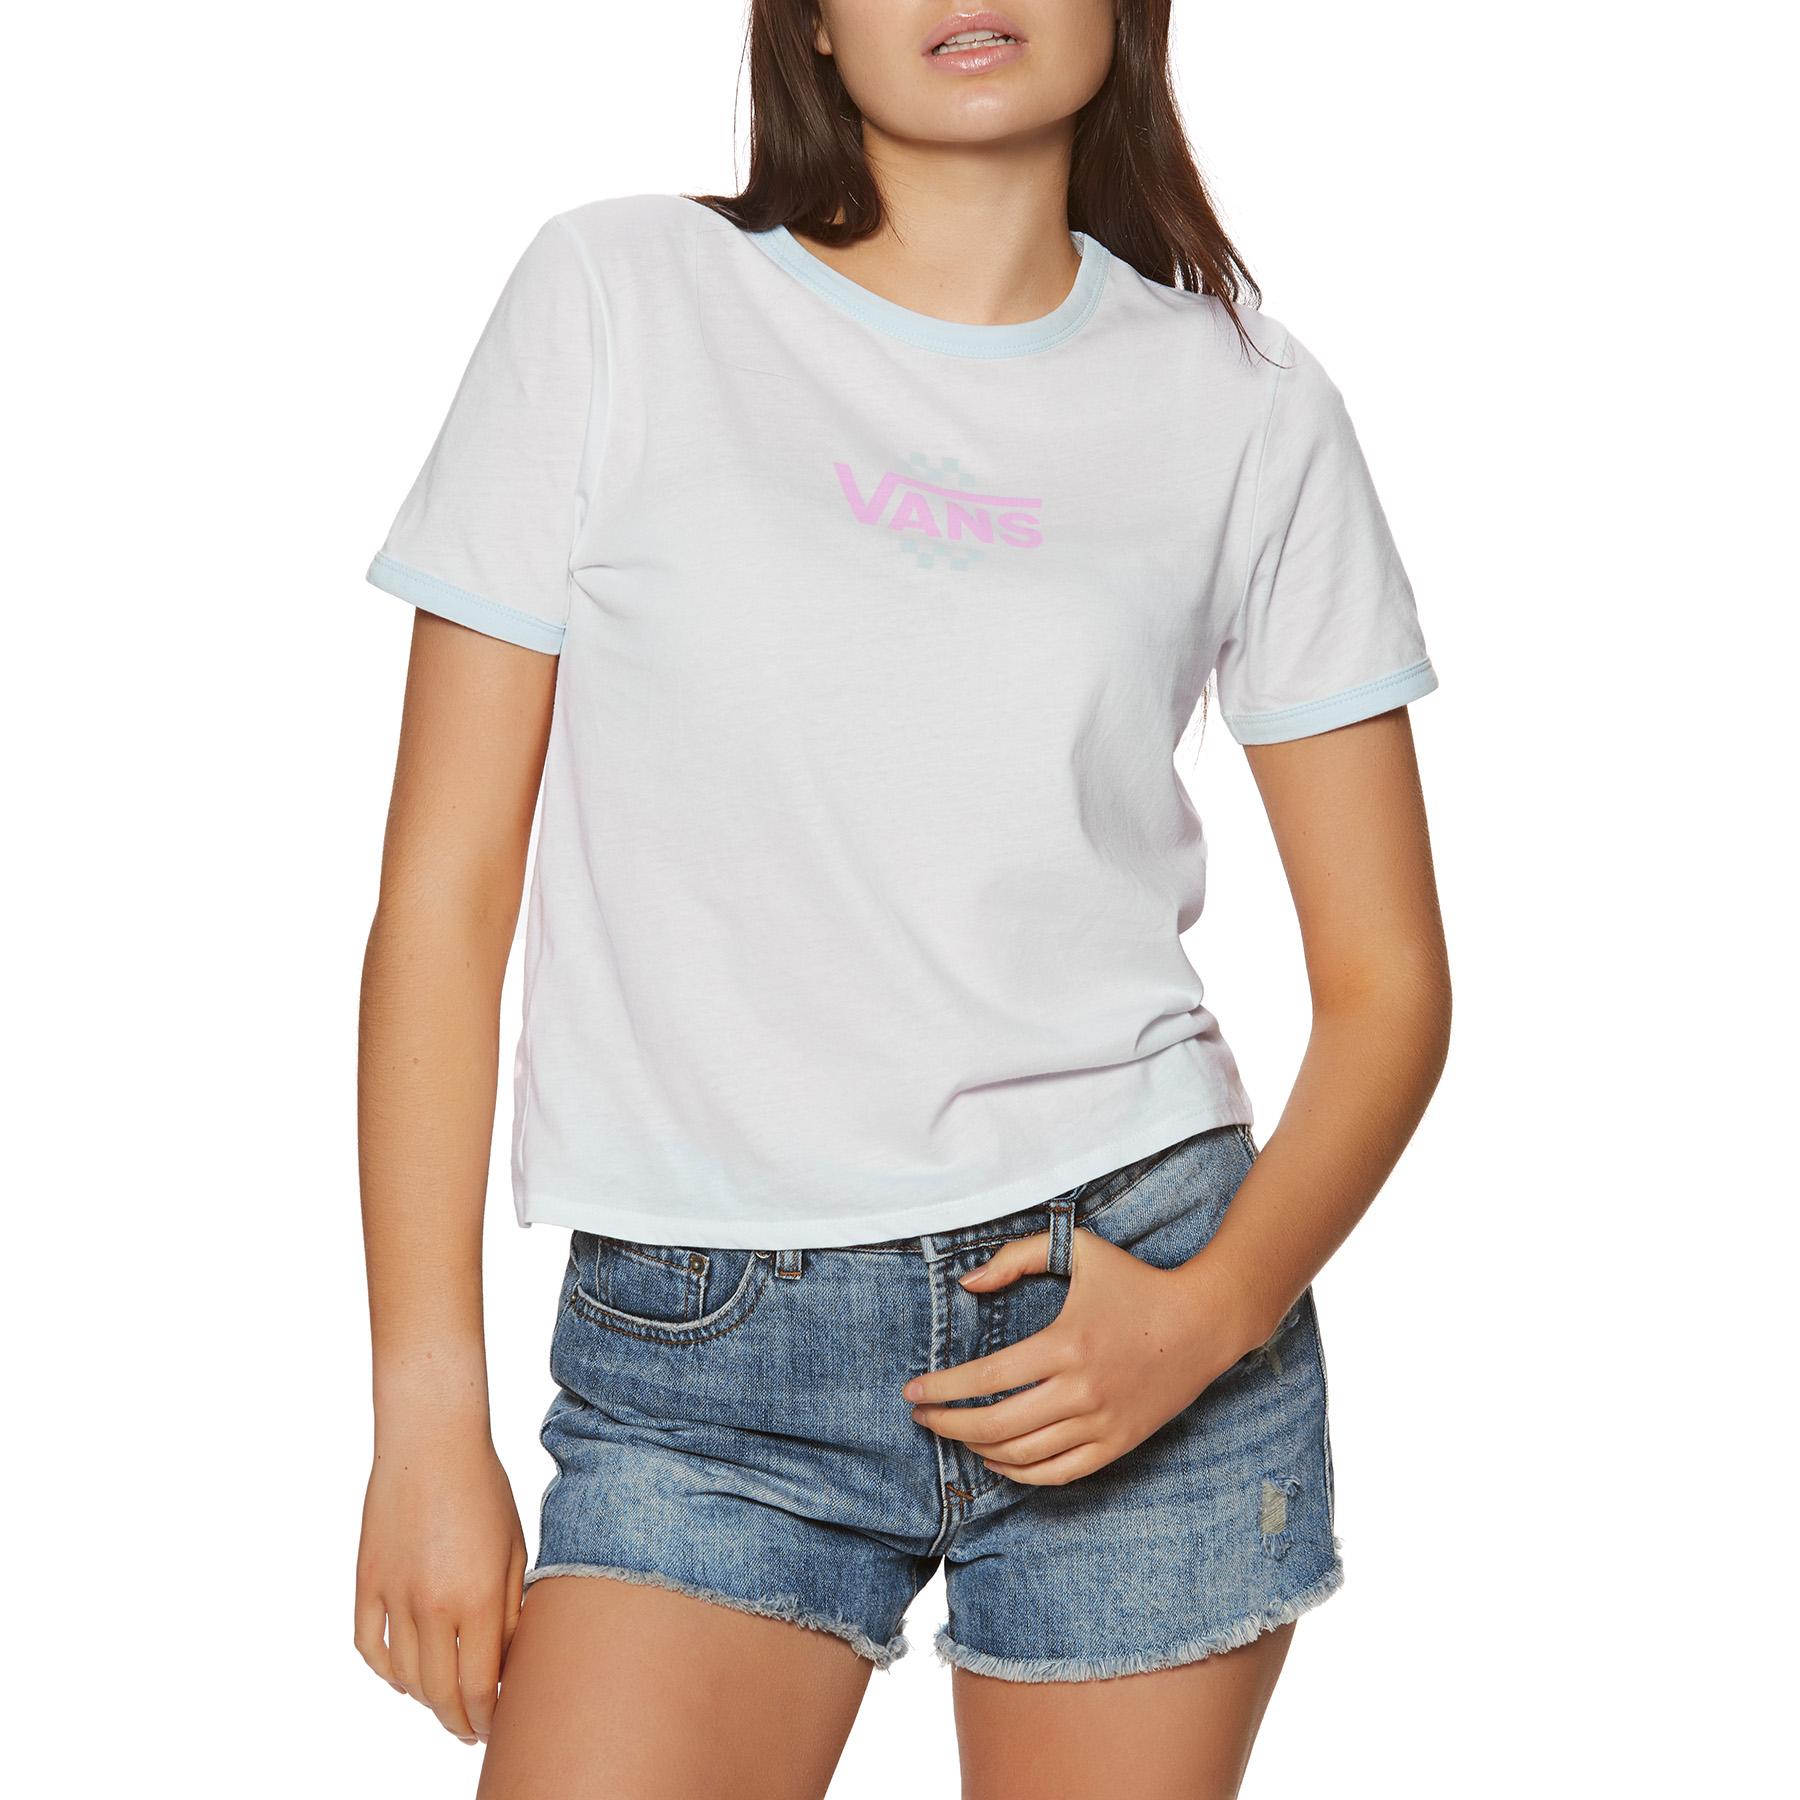 T-Shirt à Manche Courte Femme Vans Summer Schooler Ringer